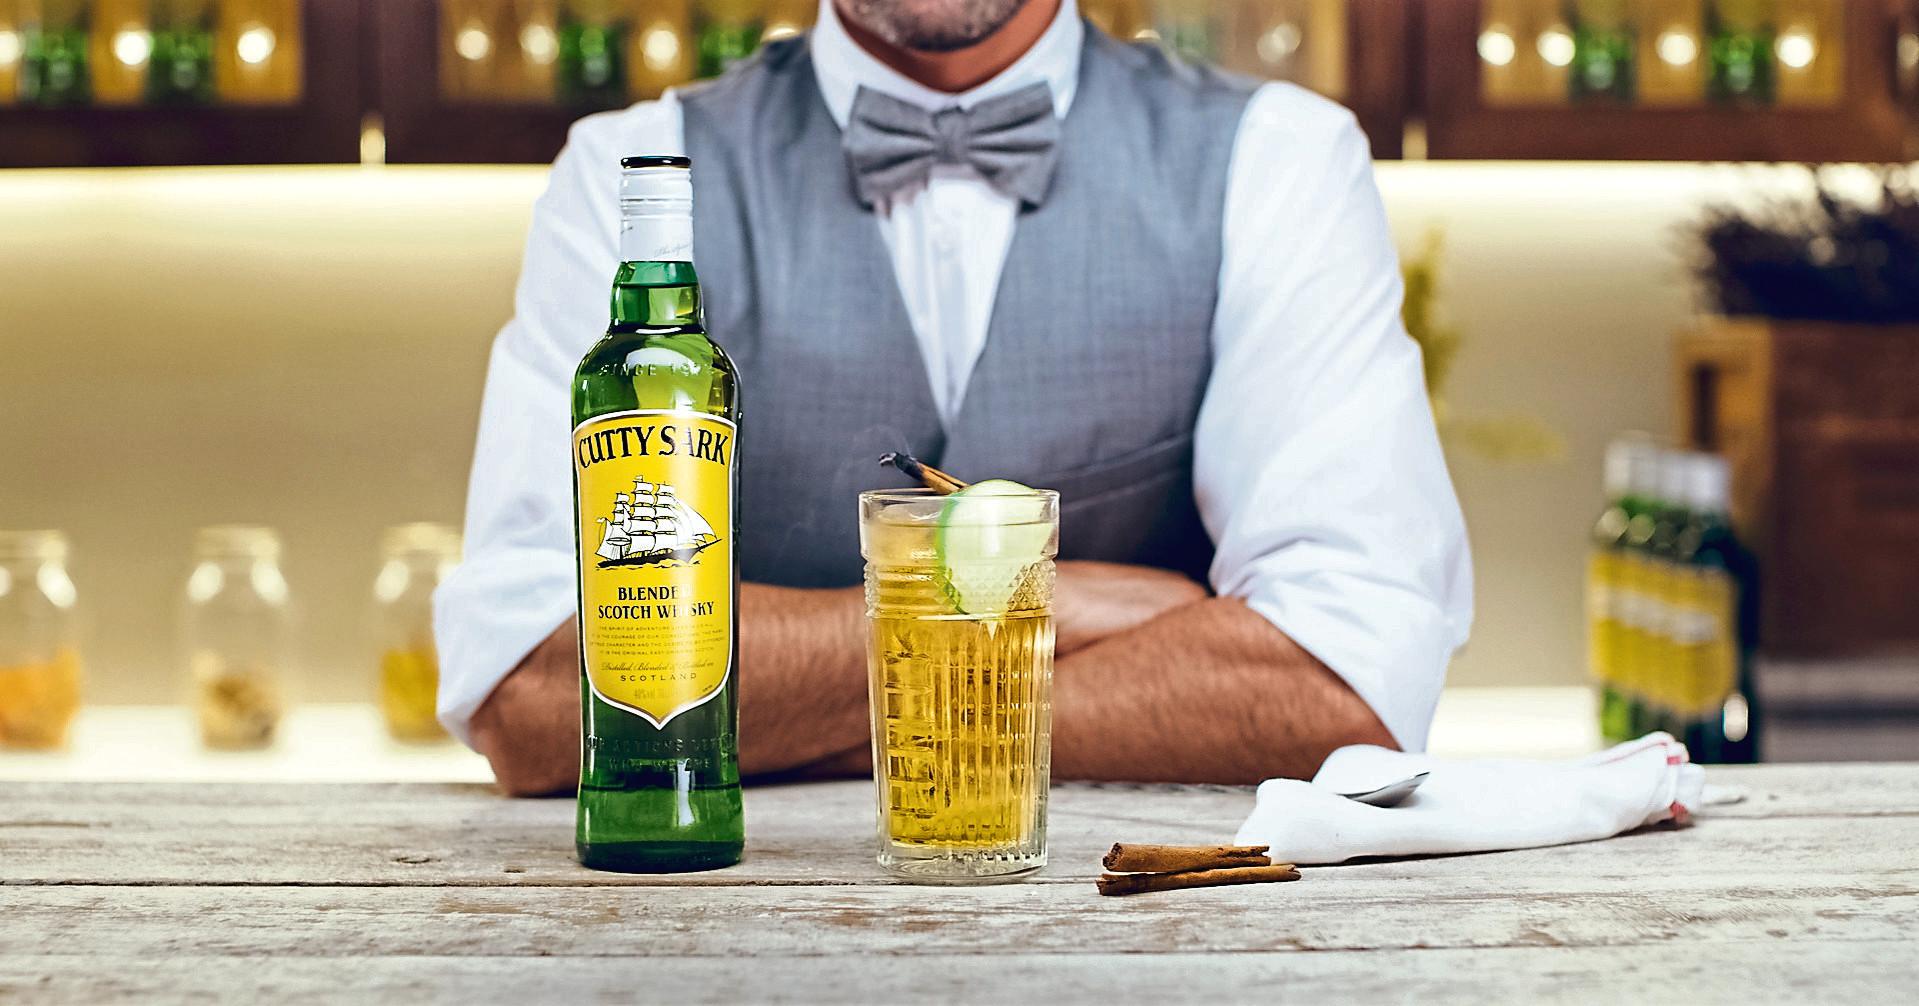 Glasgow firm Erdington said its sale of Cutty Sark to Paris-based La Martiniquaise-Bardinet will help the whisky brand to prosper.